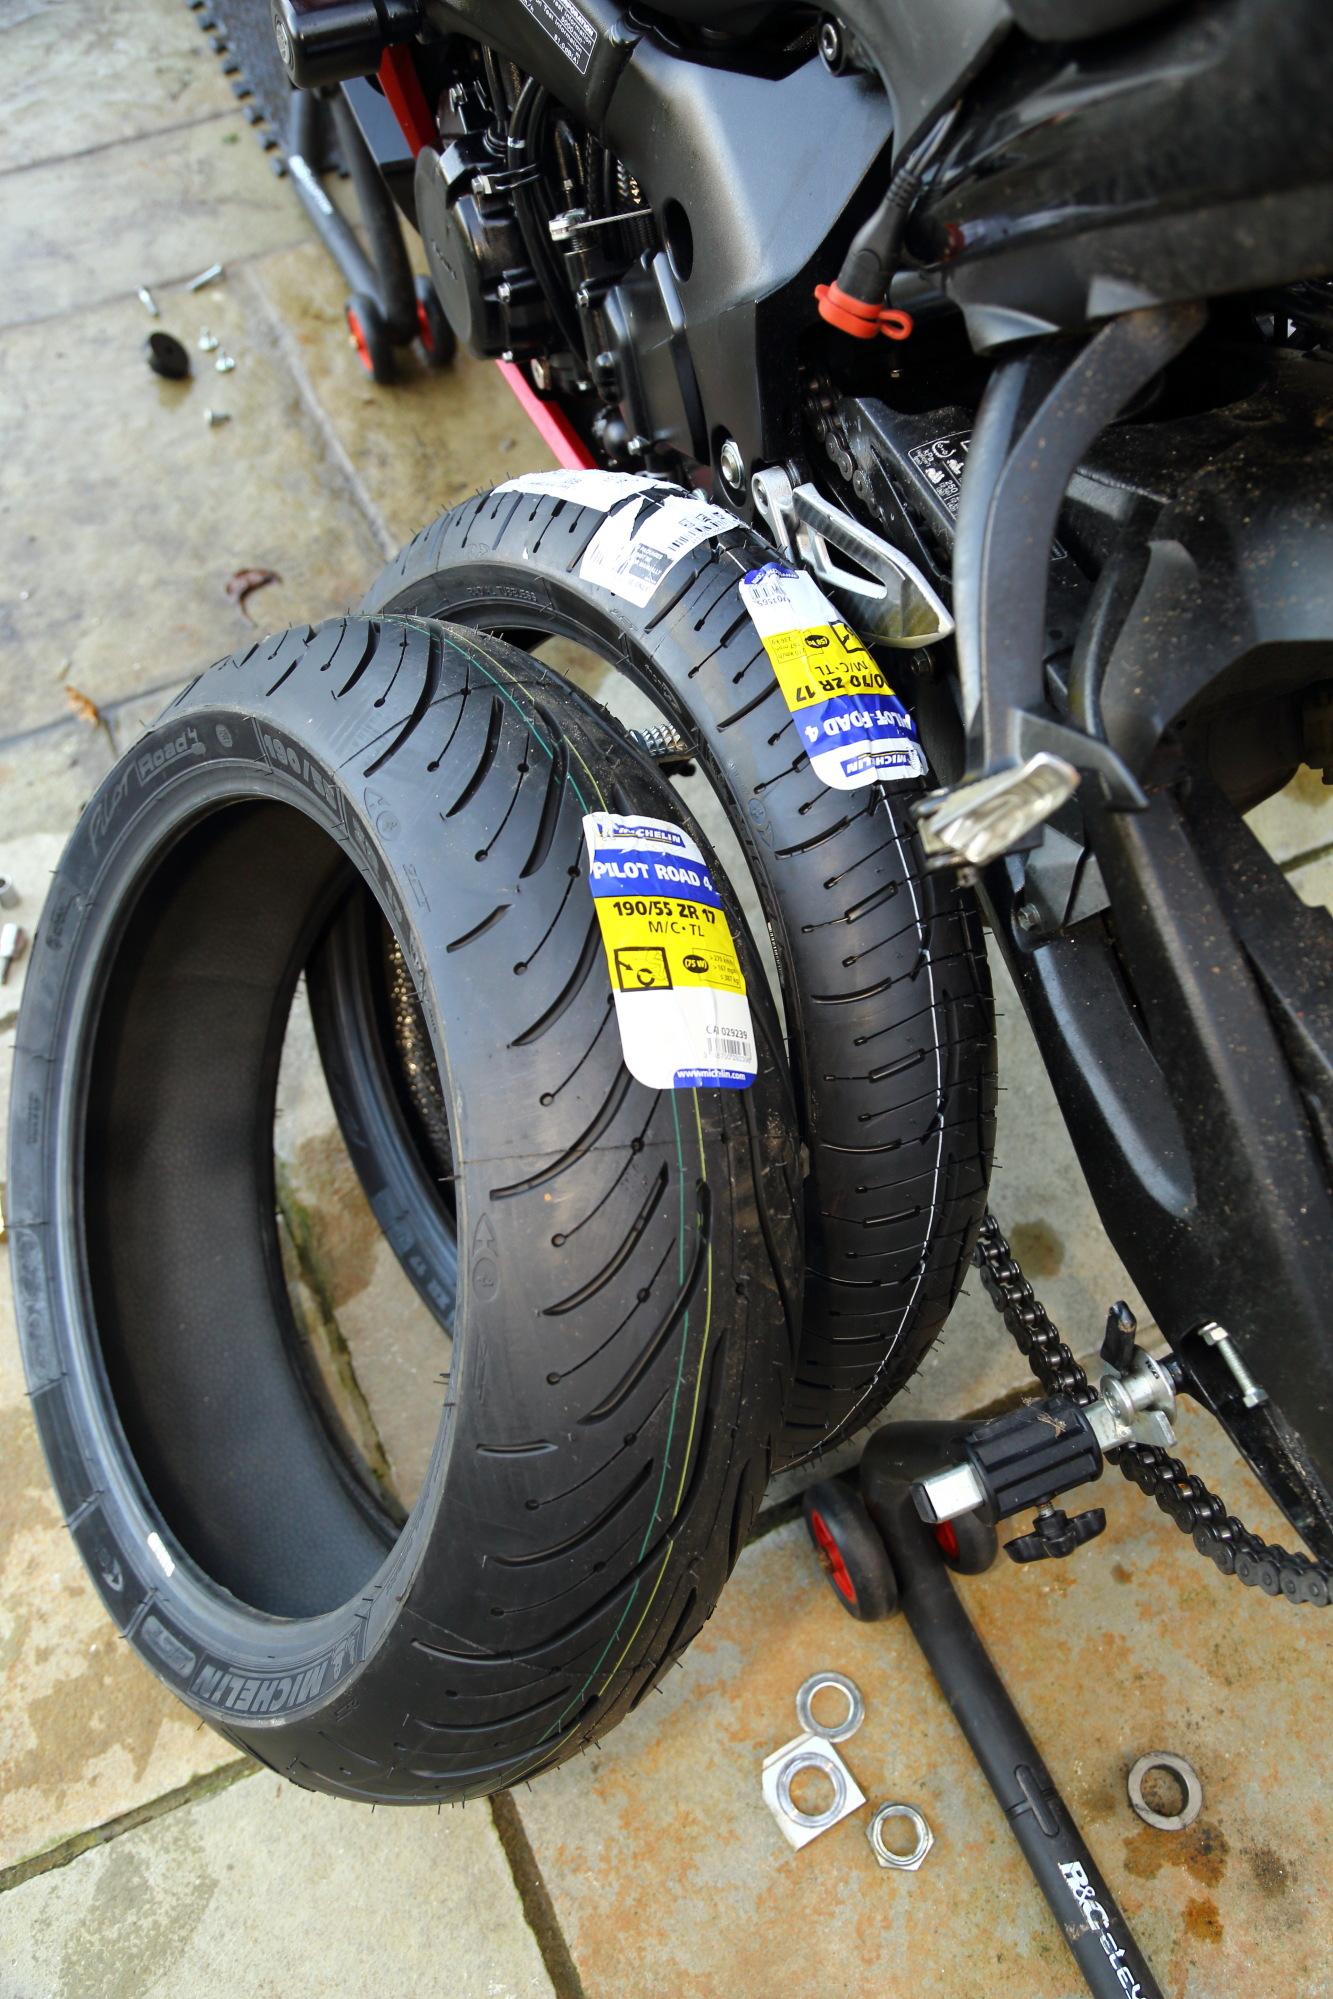 michelin pilot road 4 tyres on gsx s1000f superbike magazine. Black Bedroom Furniture Sets. Home Design Ideas